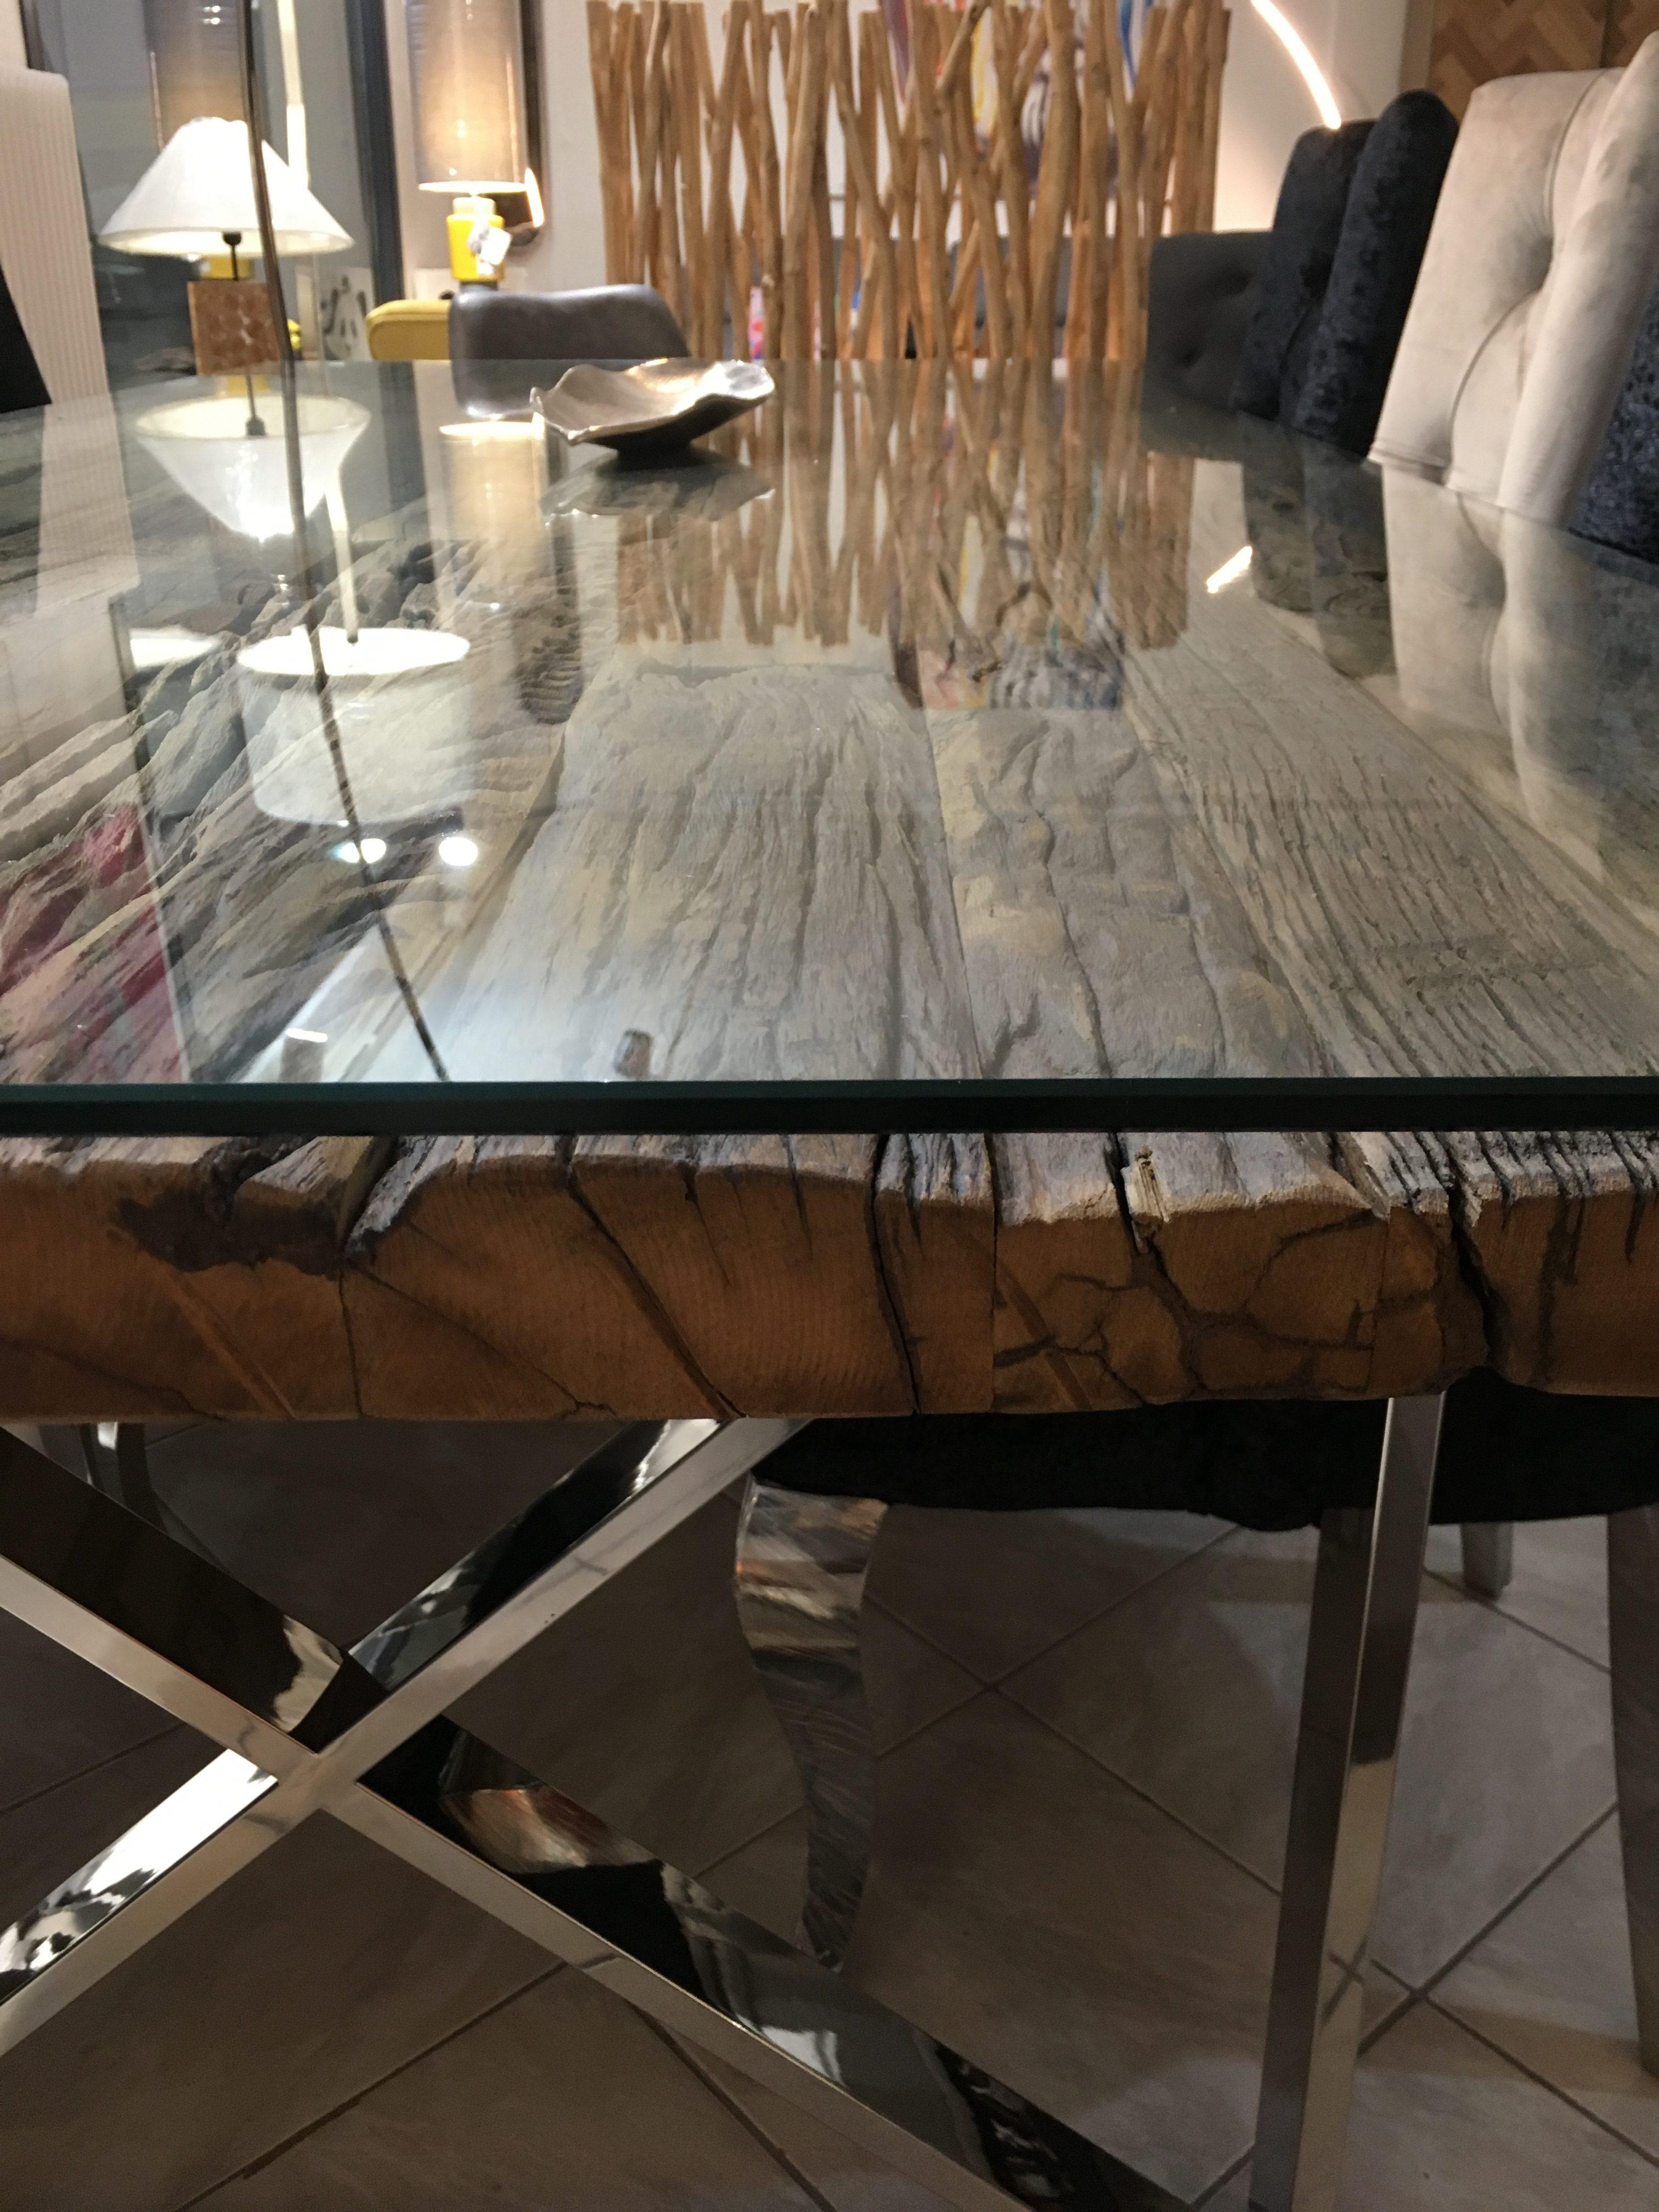 table tendance design bois brut recycle metal chrome plateau verre boisetdeco cambresis nord. Black Bedroom Furniture Sets. Home Design Ideas